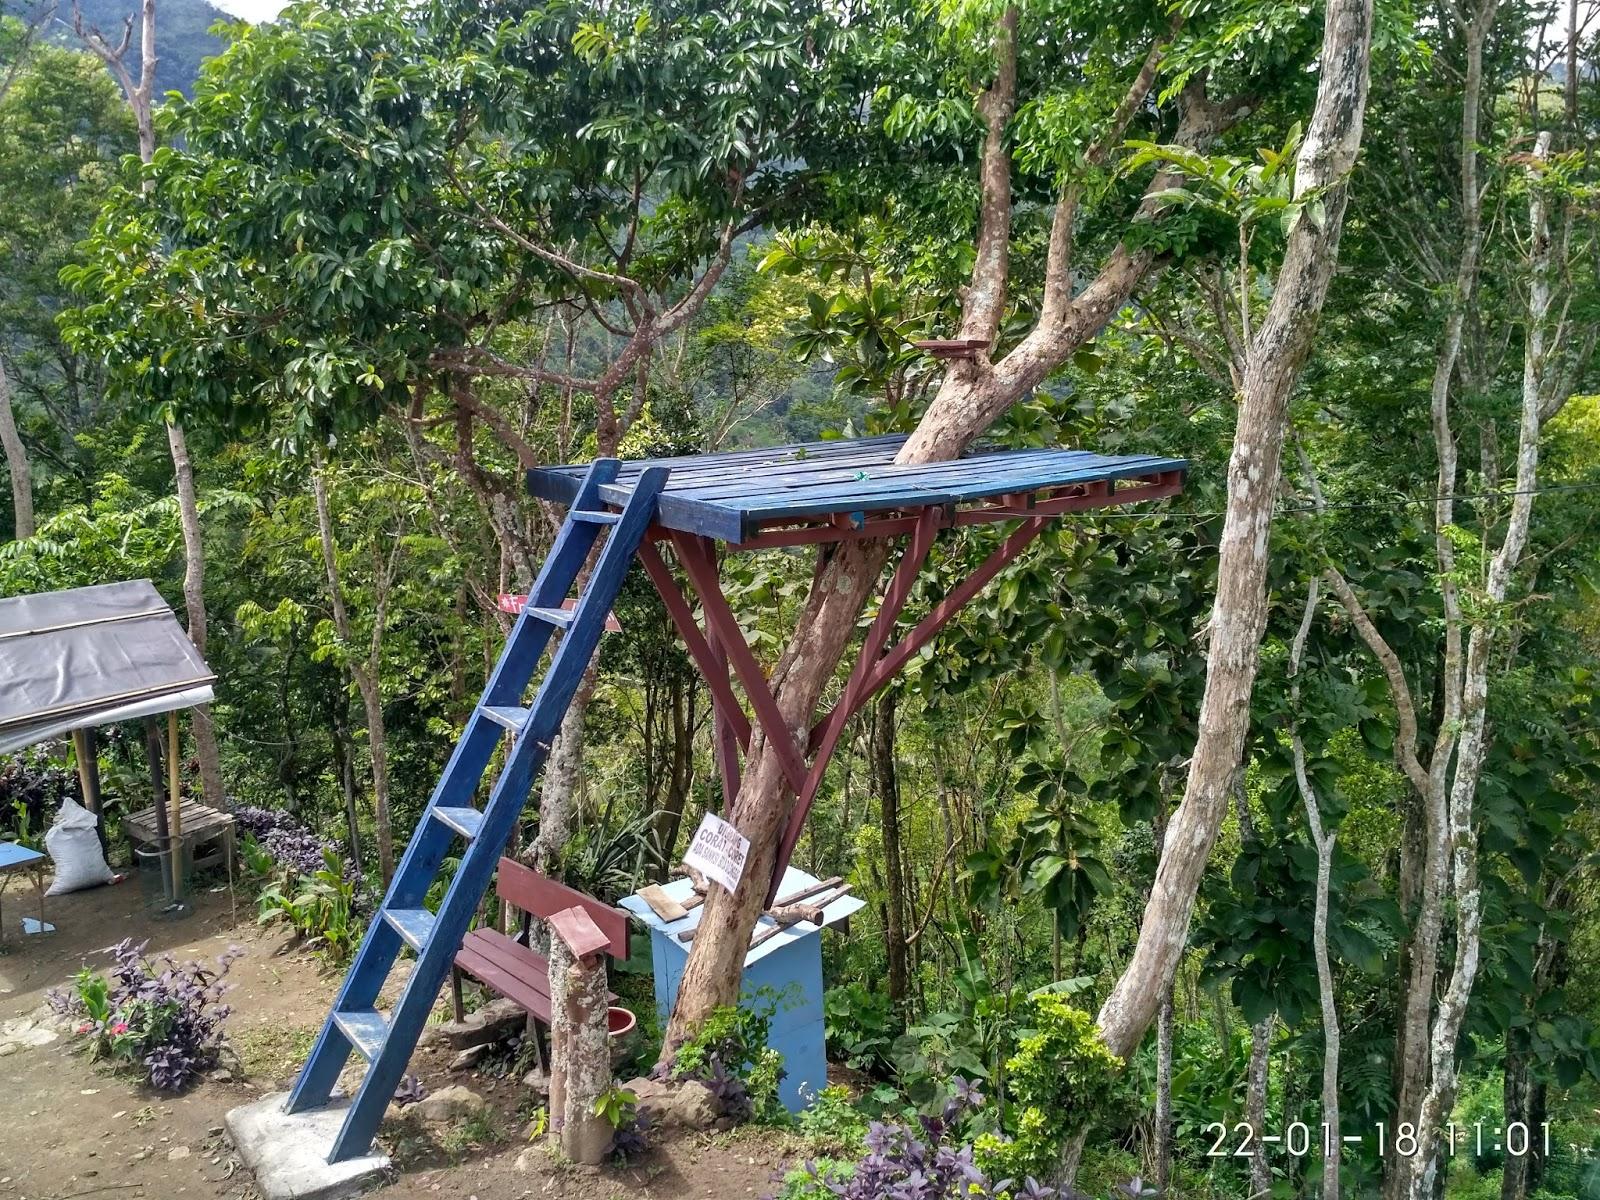 Menikmati Keindahan Alam Pegunungan Menoreh Punthuk Mongkrong Gardu Pandang Photo